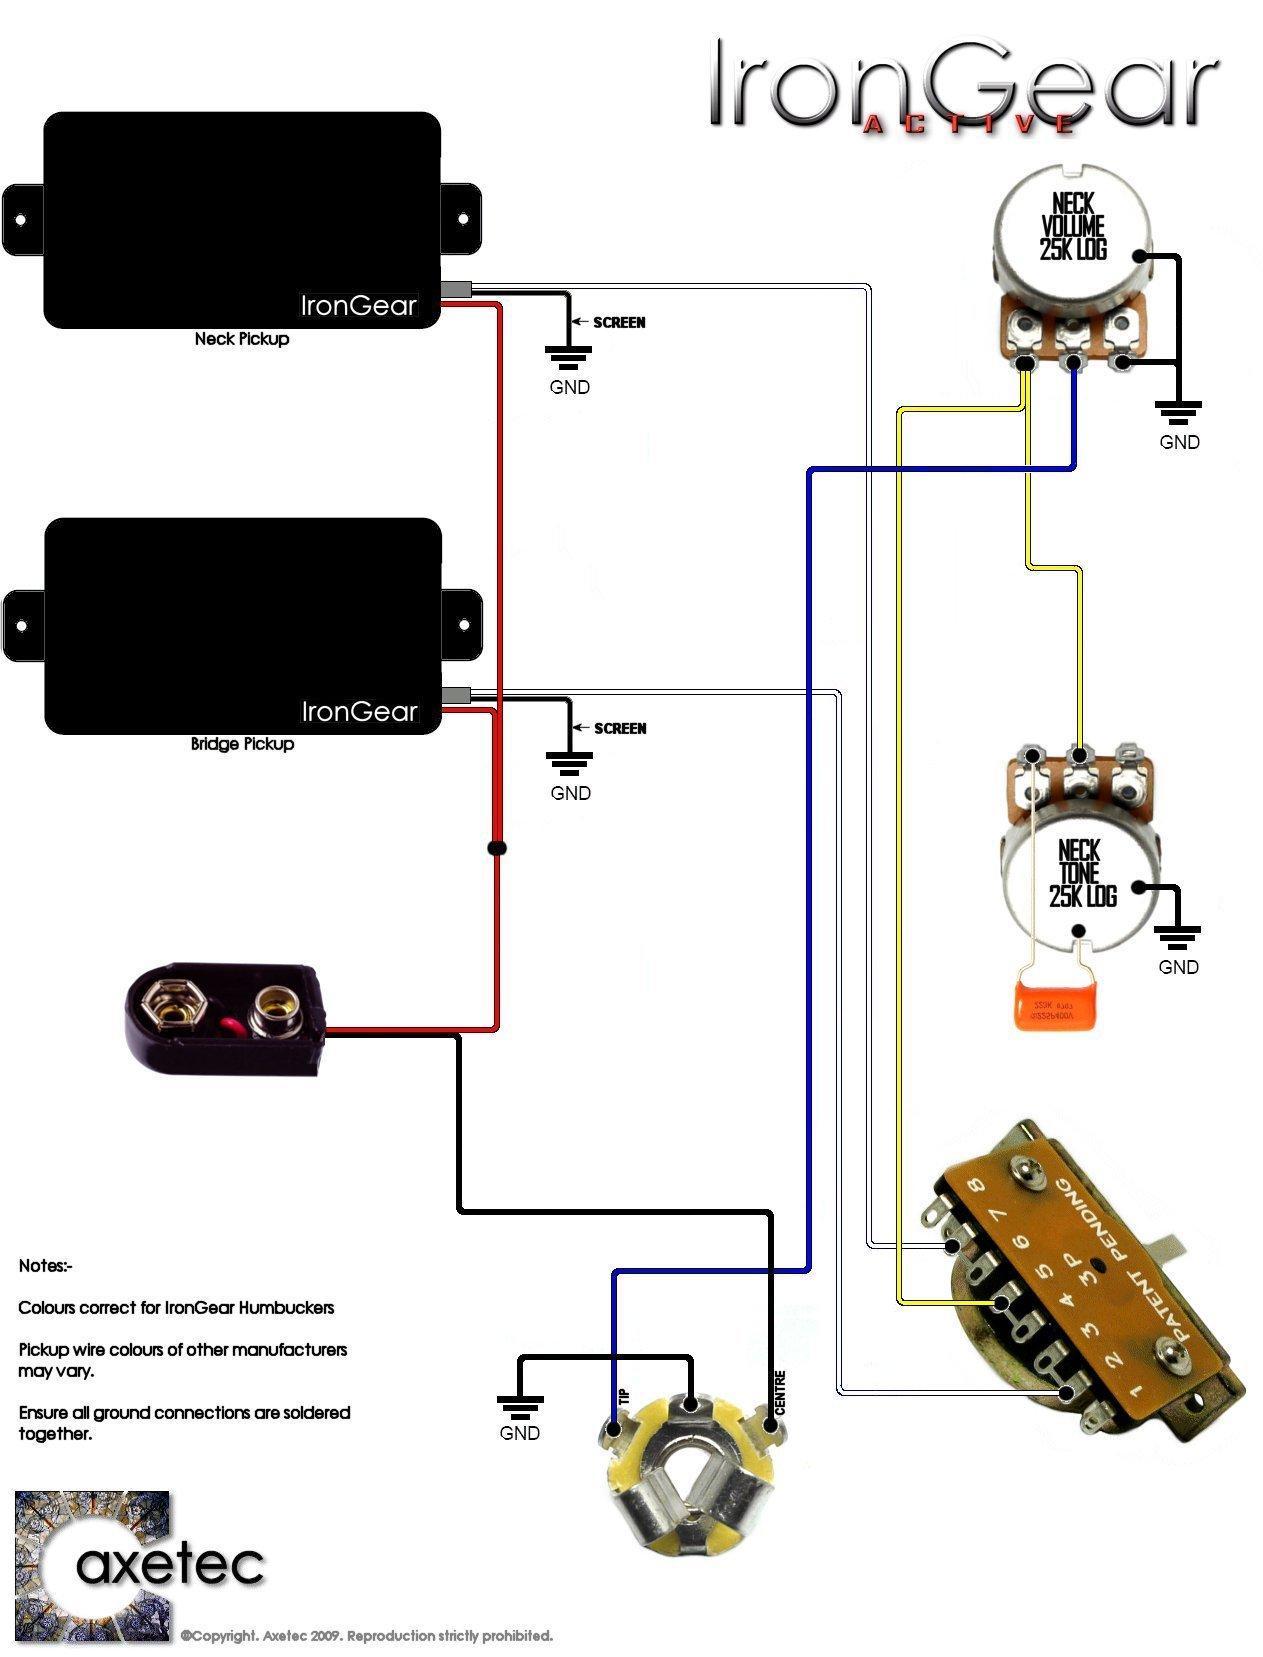 2_x_active_humbuckers_ _1vol__1tone__3way_blade_v02?resized665%2C872 emg hz pickups wiring diagram efcaviation com emg select wiring at mifinder.co